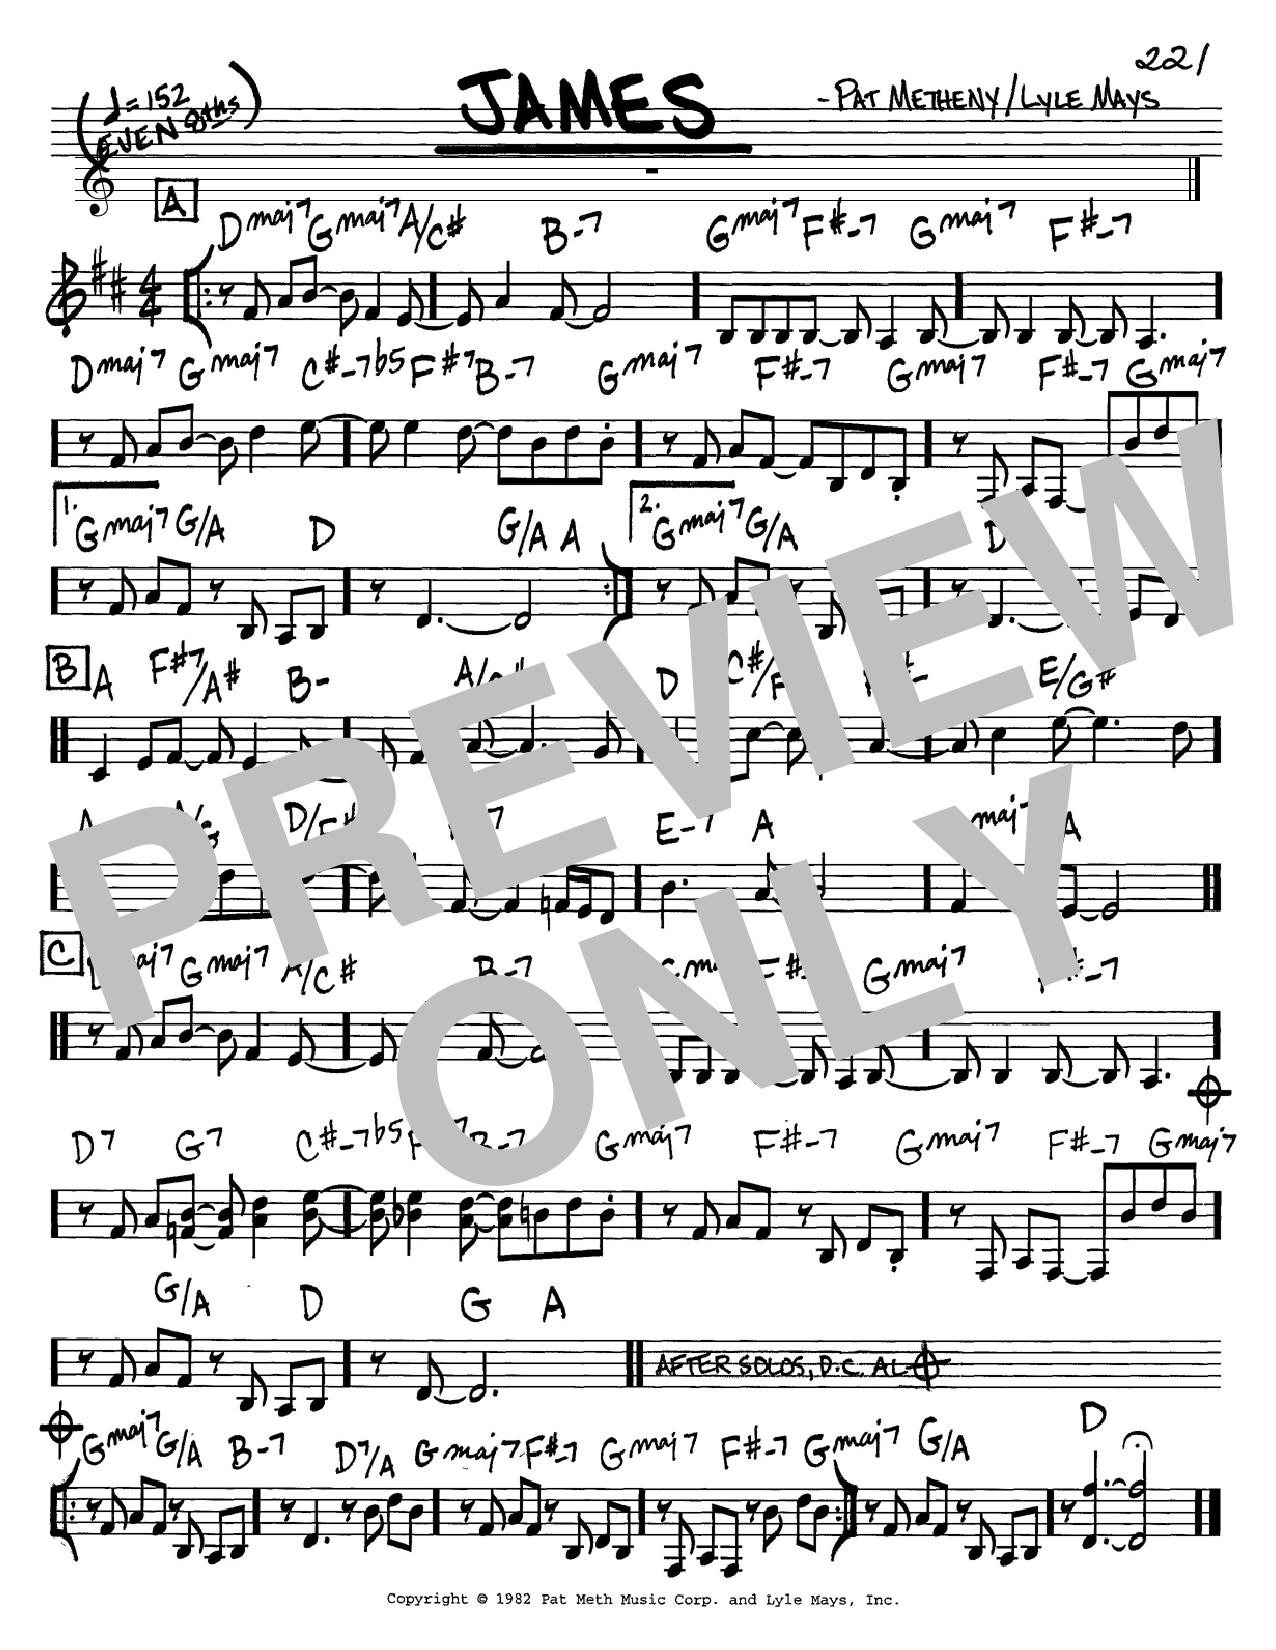 Pat Metheny James sheet music notes and chords